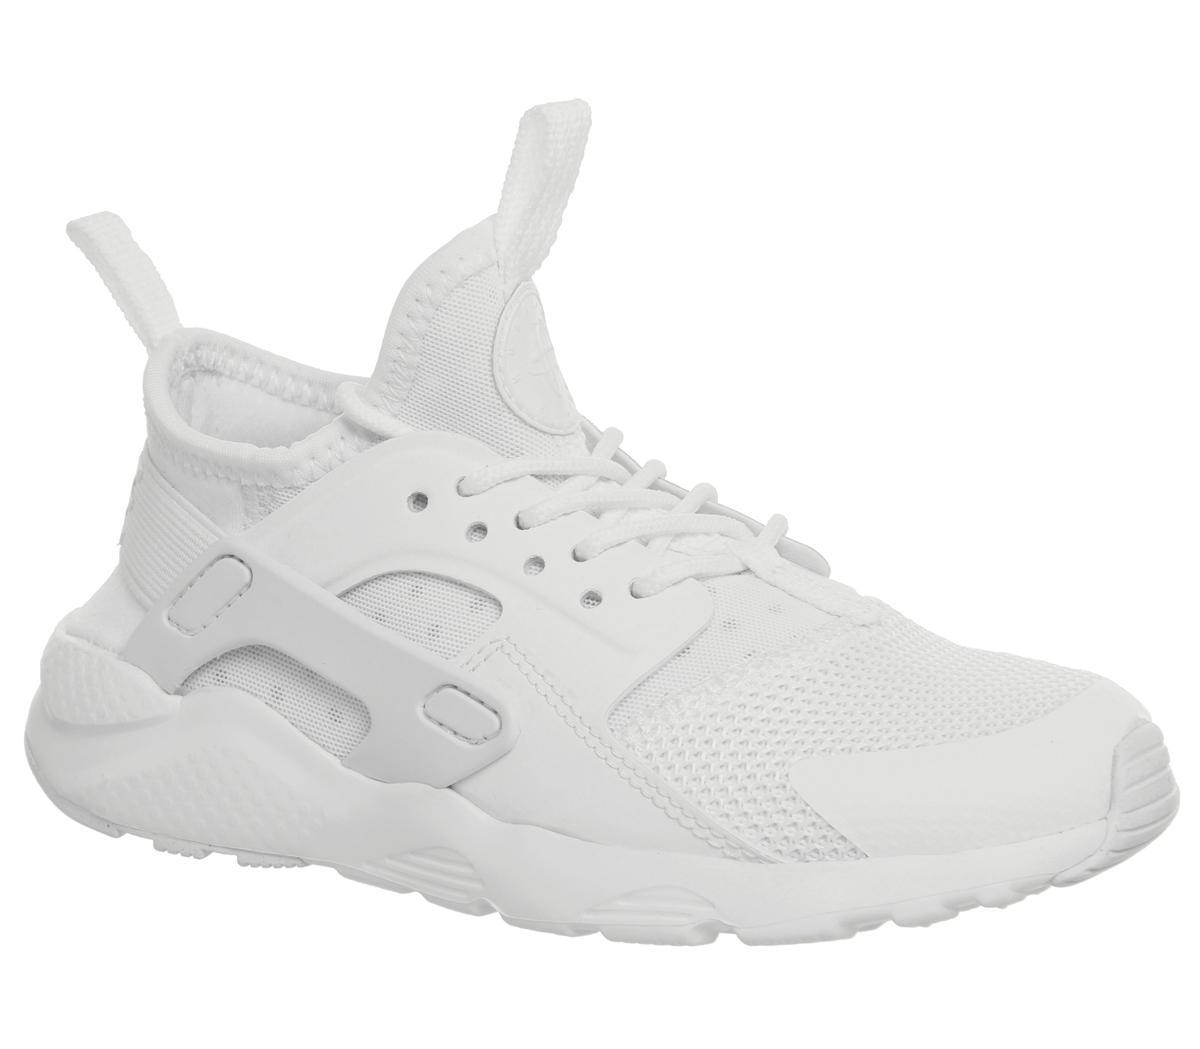 Nike Huarache Run Ultra Ps White - Unisex